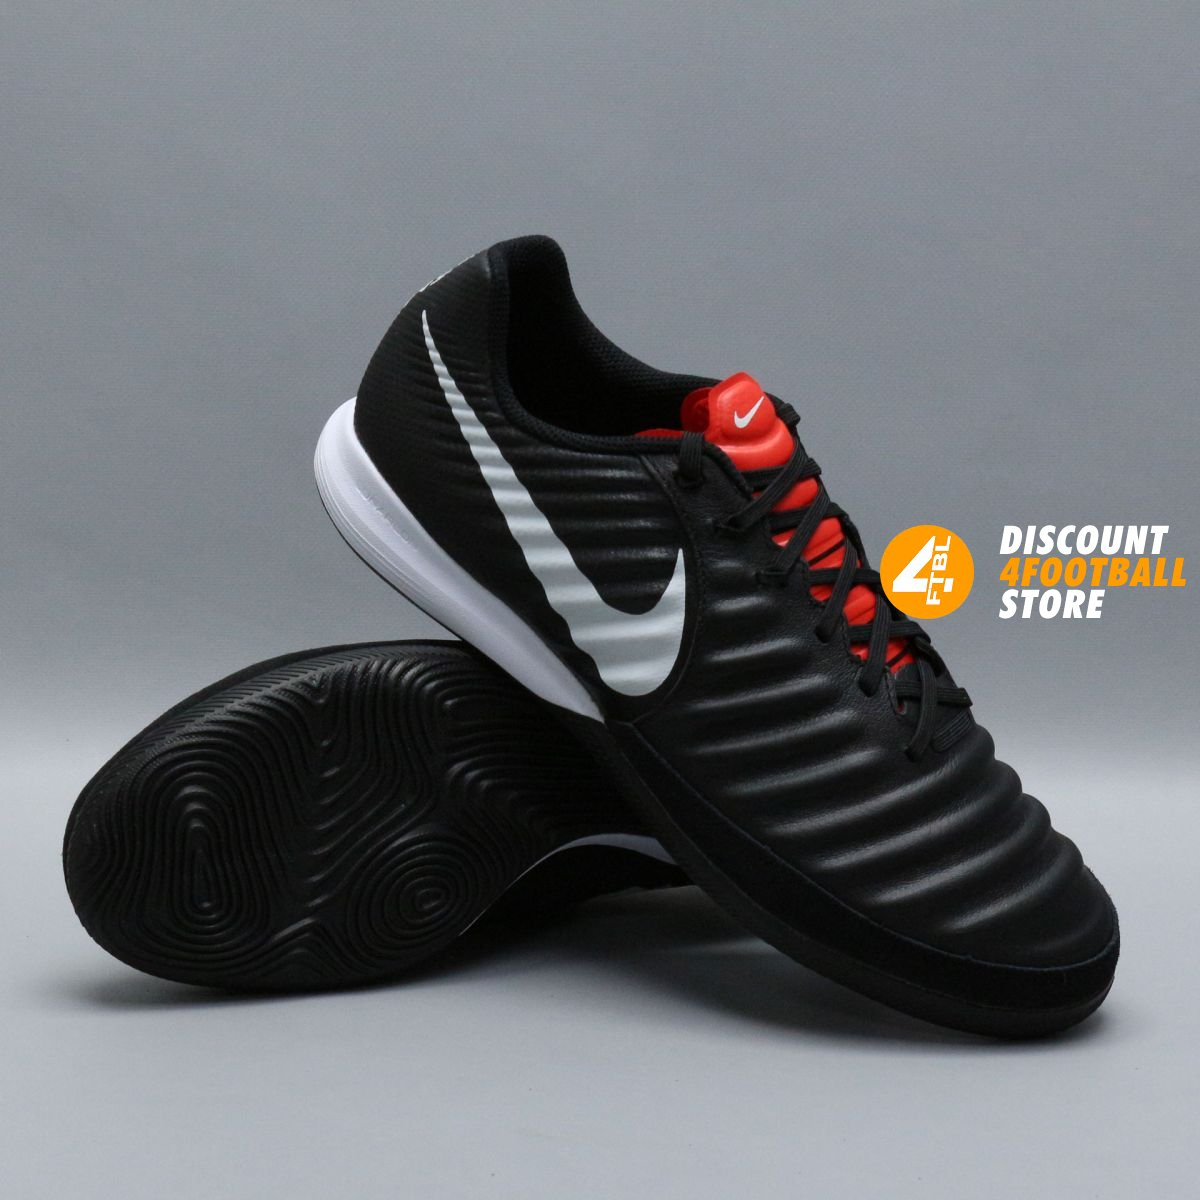 57f07ed1c2d81a Футзалки Nike Tiempo Lunar Legend Pro AH7246-006 купить на 4football ...